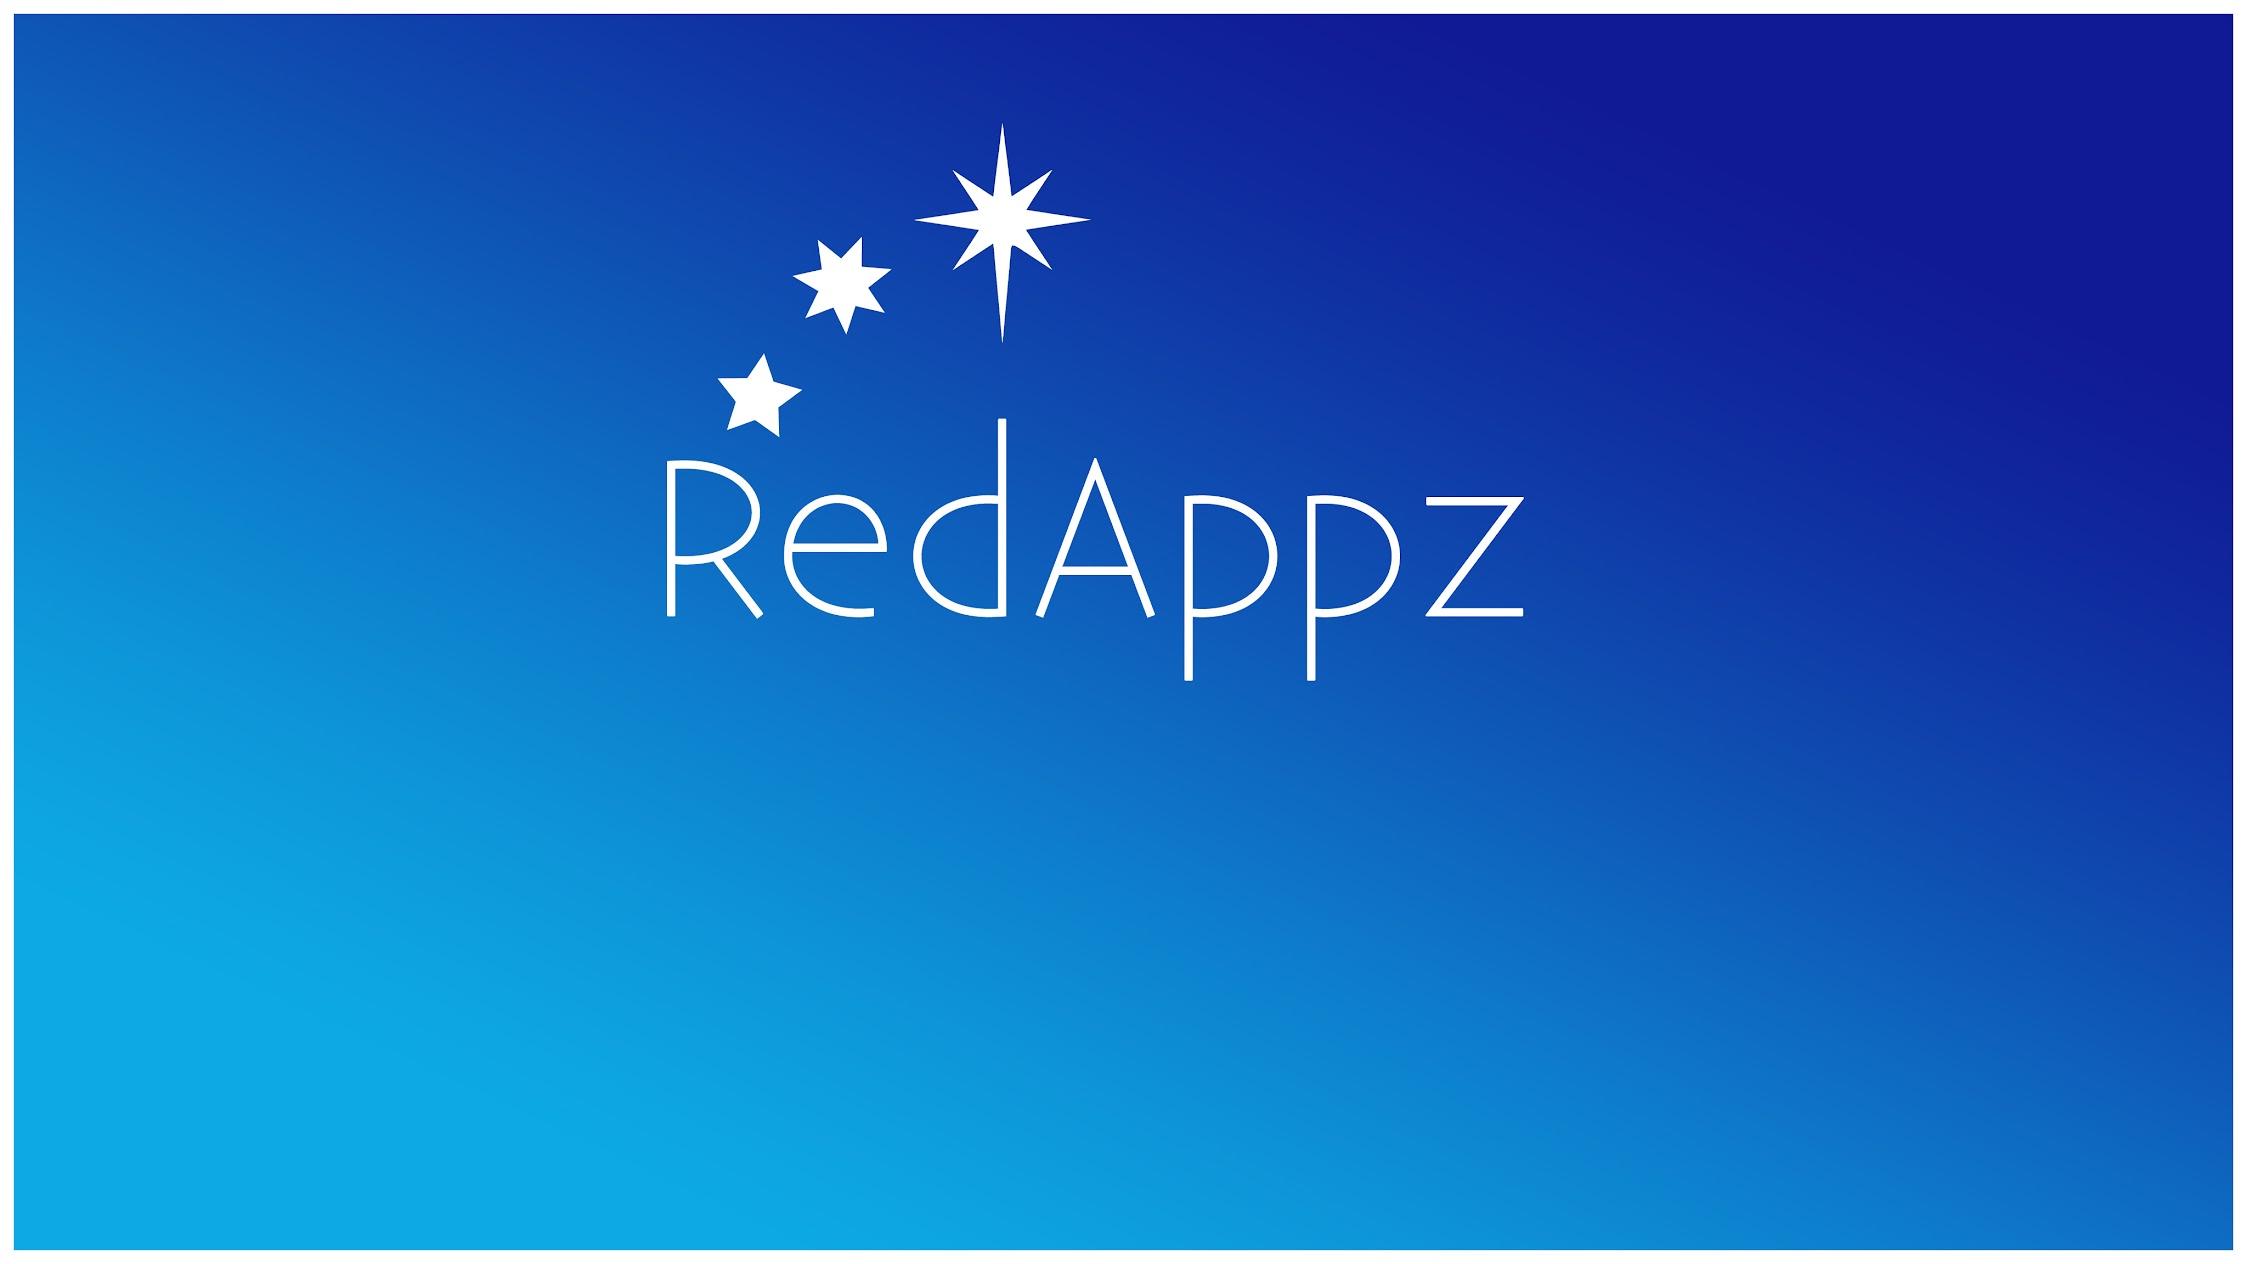 RedAppz